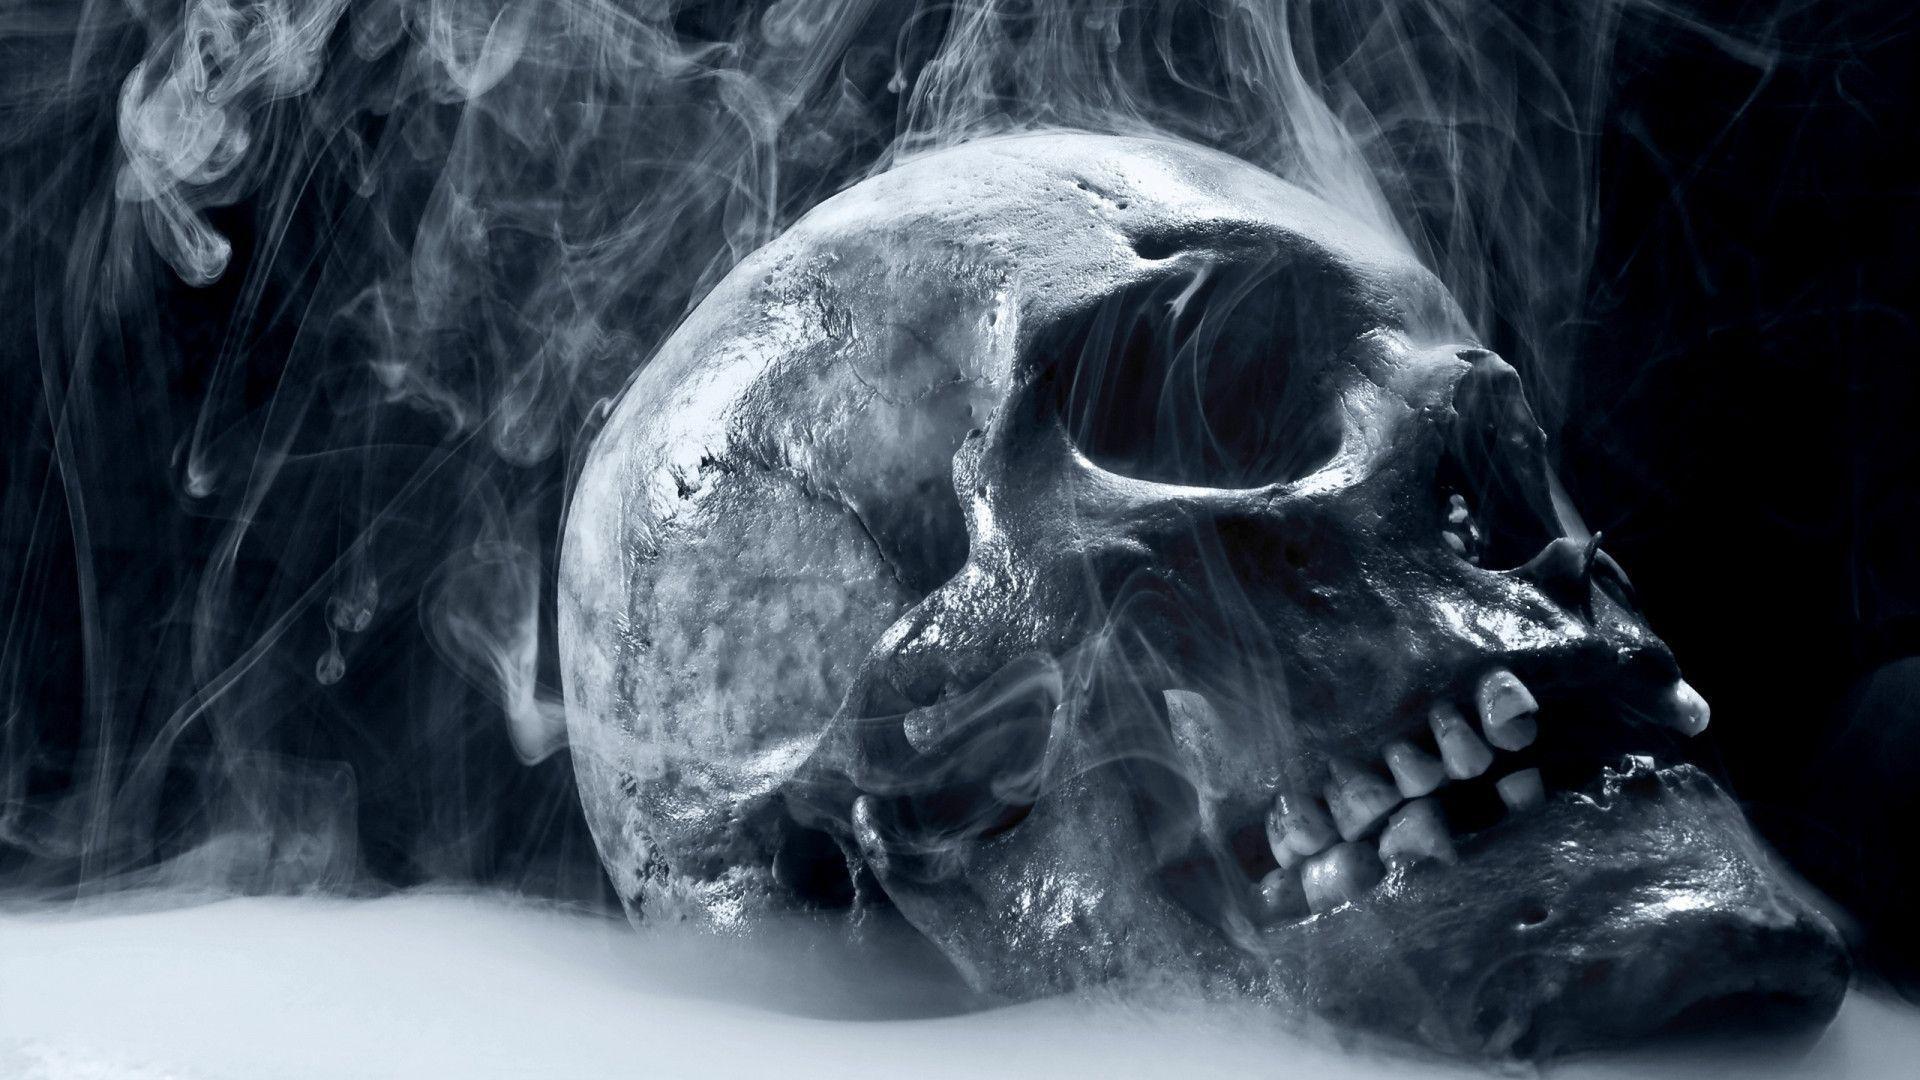 Hd Skull Desktop Wallpapers Top Free Hd Skull Desktop Backgrounds Wallpaperaccess